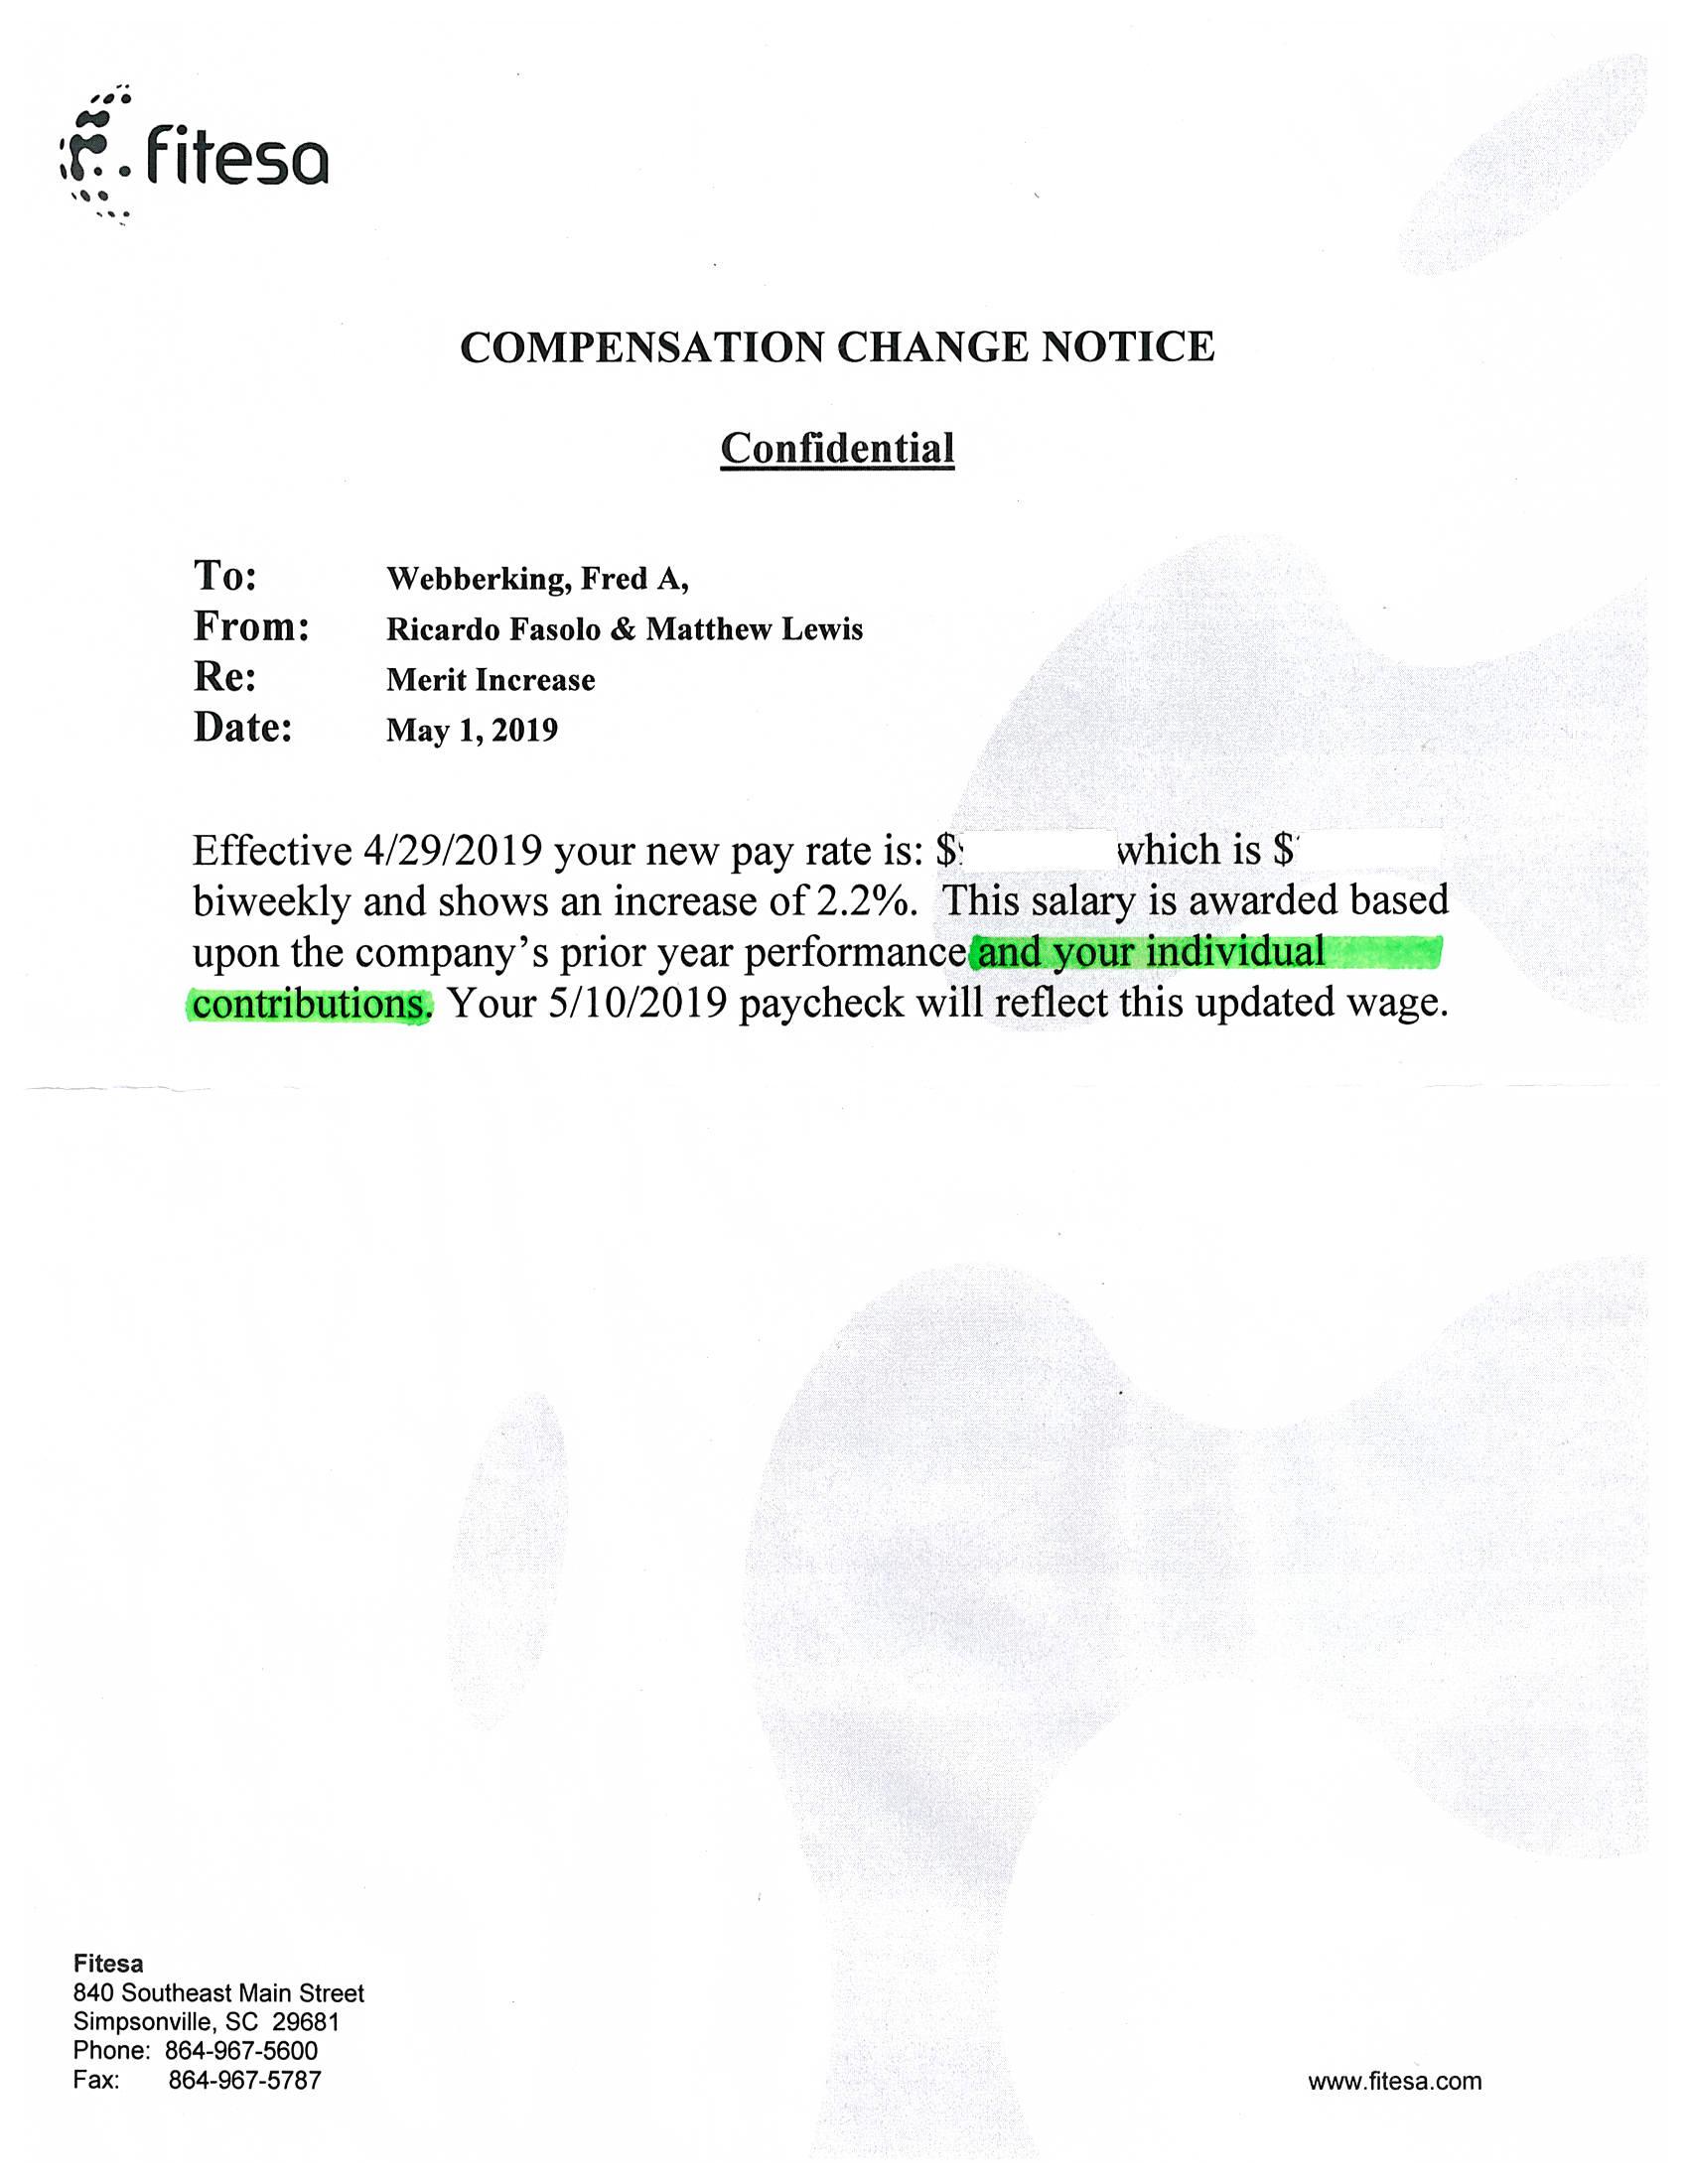 Reference Letter - Fitesa - Compensation Change Notice 2019